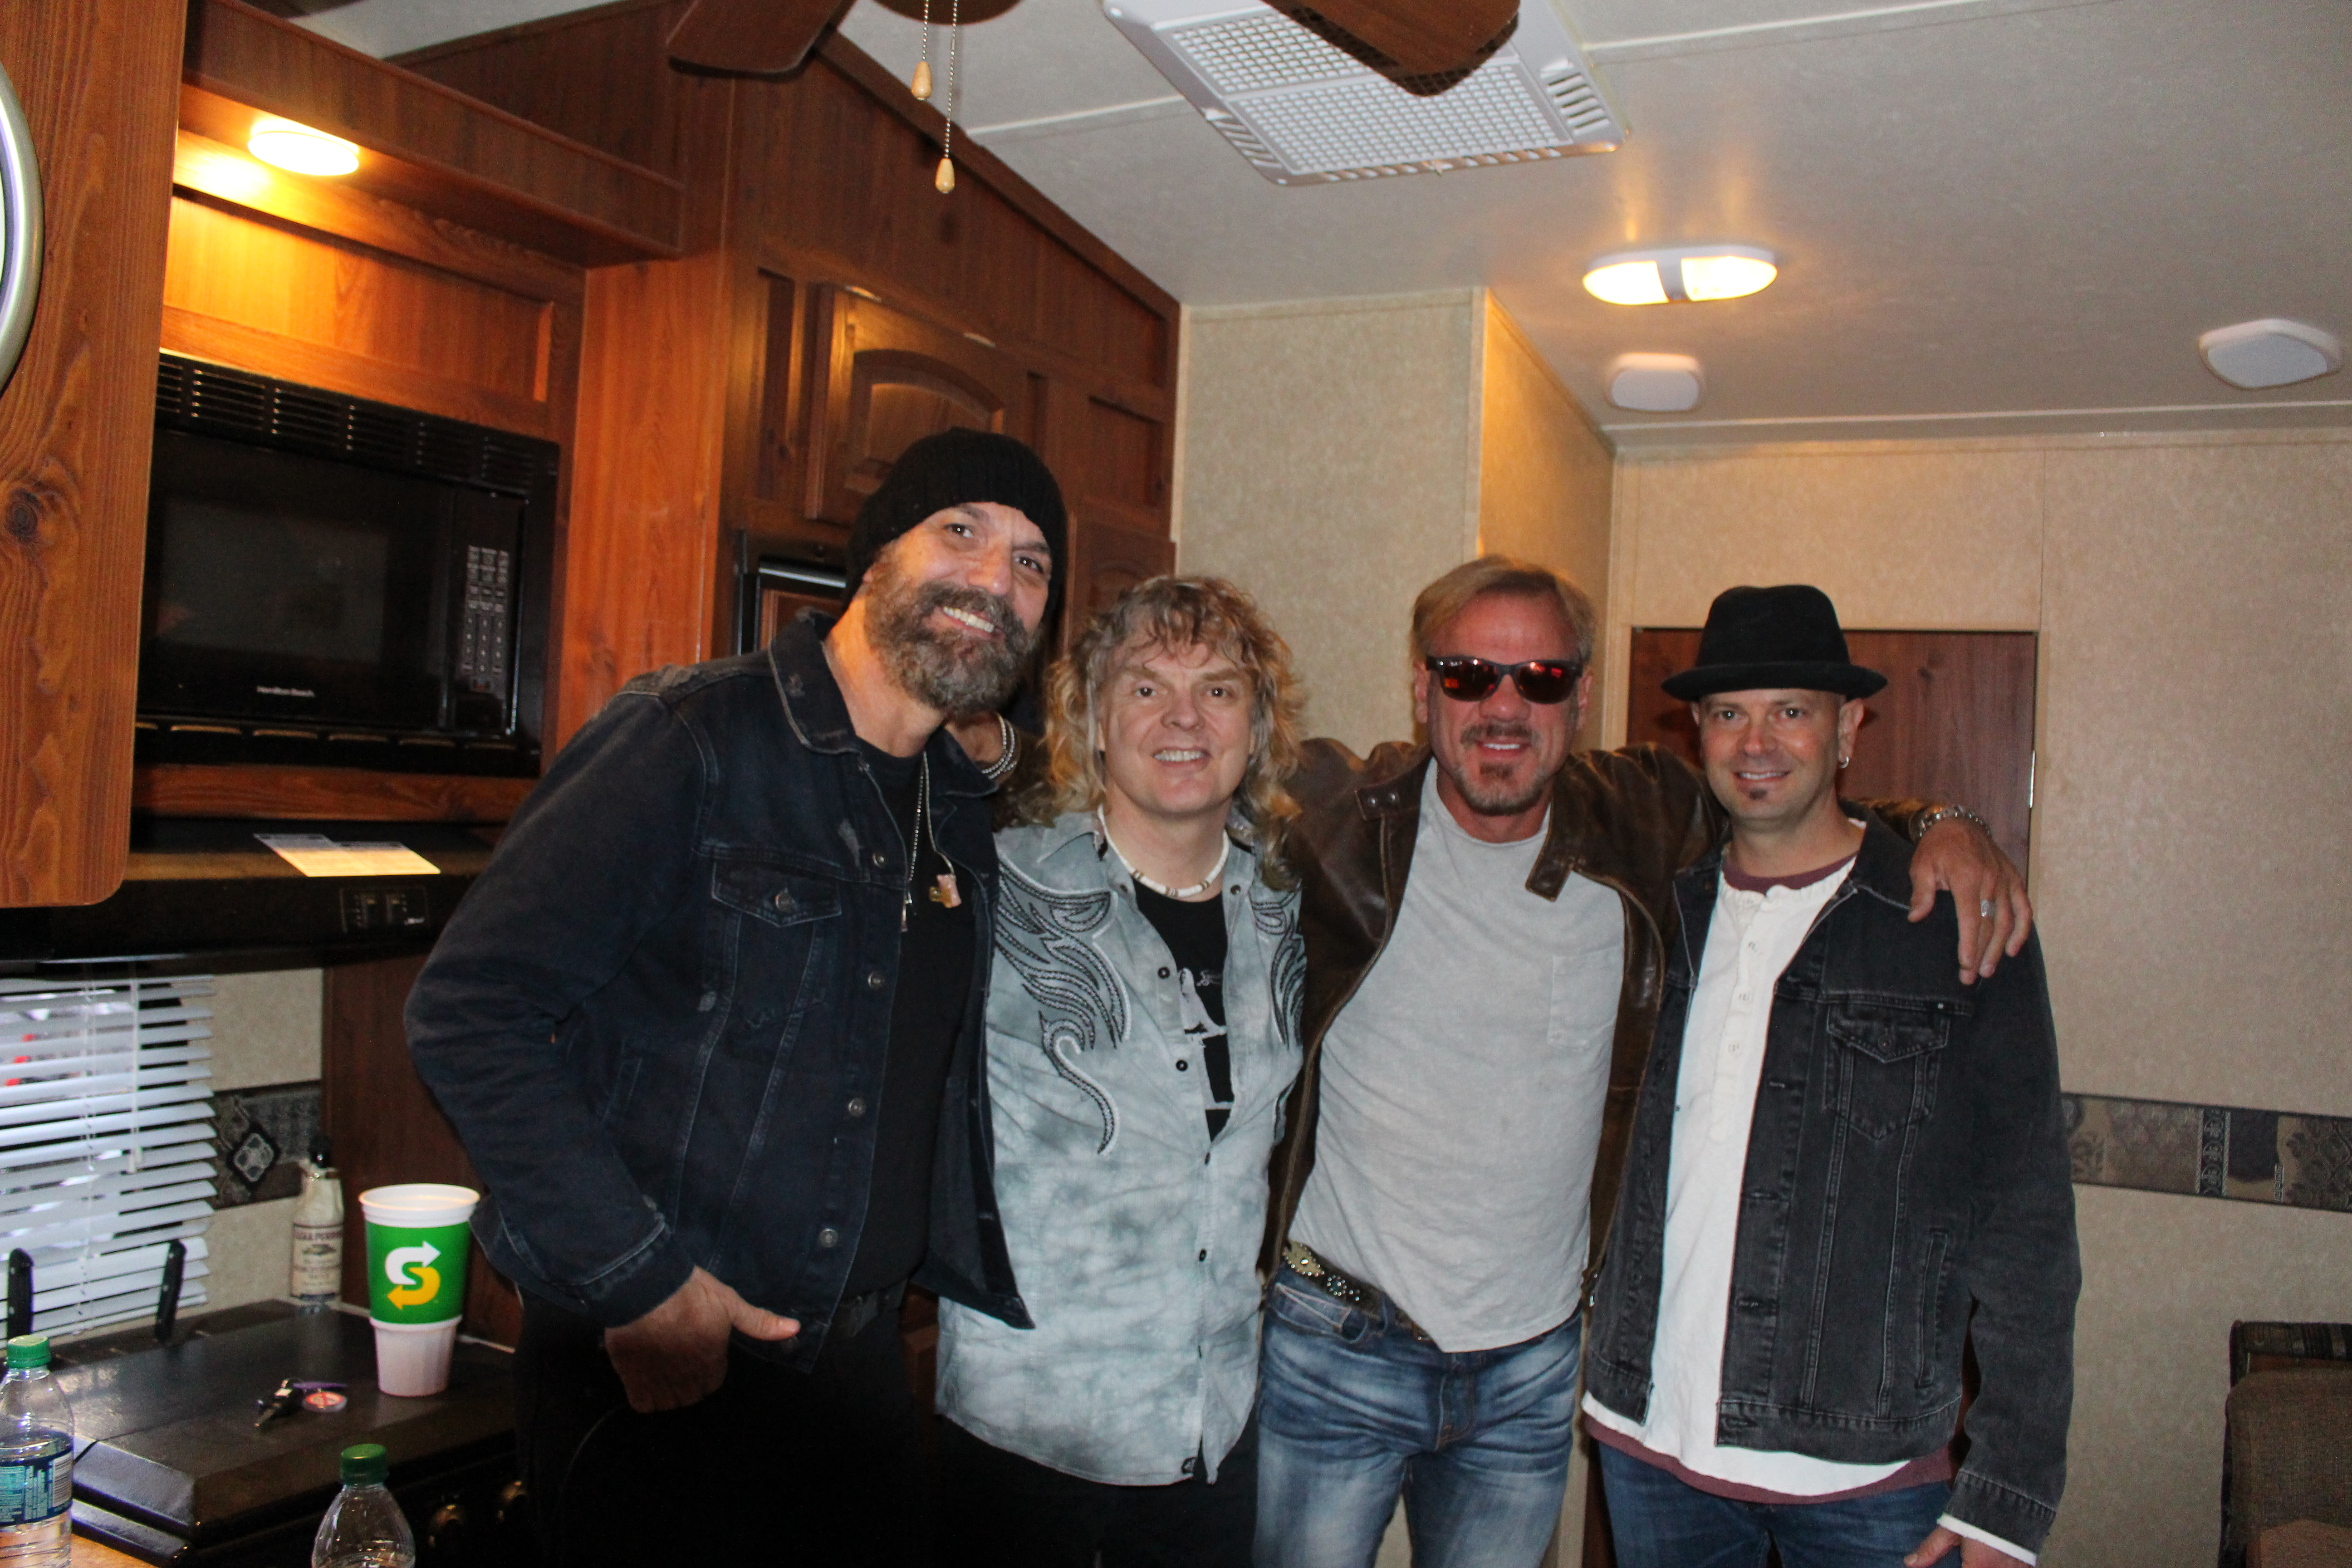 With Phil Vassar Steve and Jeff